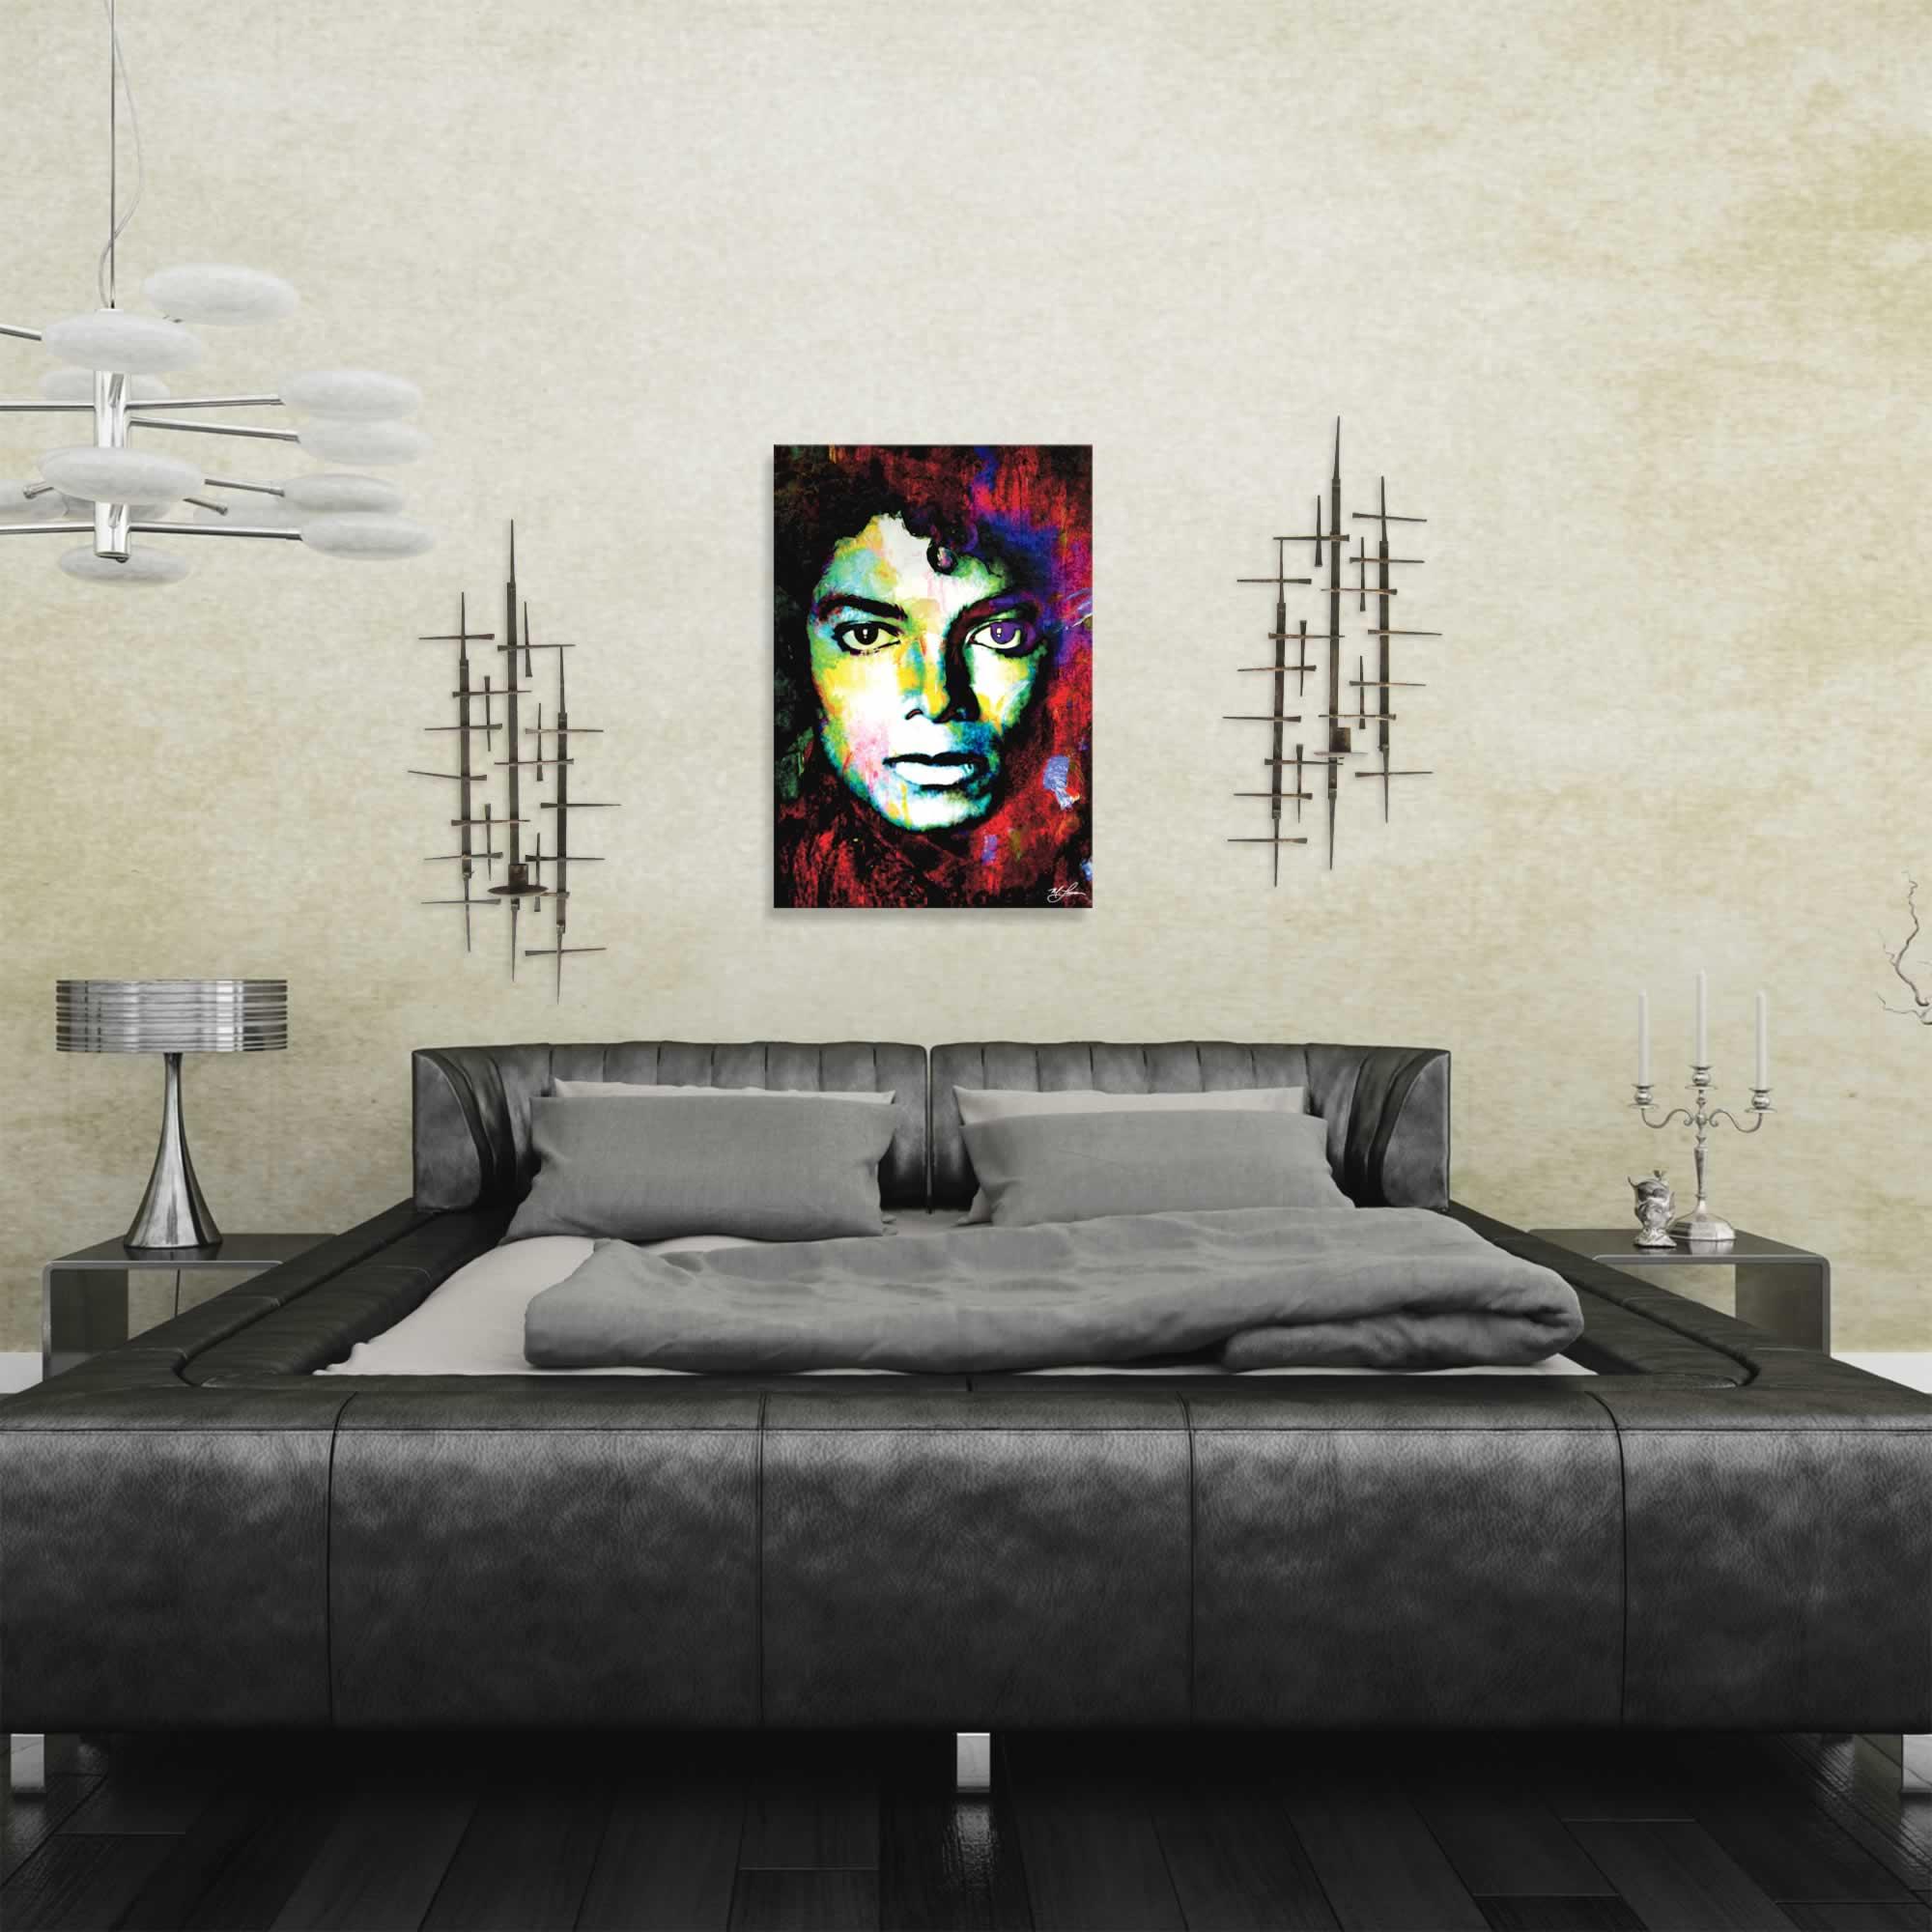 Michael Jackson Study 1 by Mark Lewis - Celebrity Pop Art on Metal or Plexiglass - ML0029